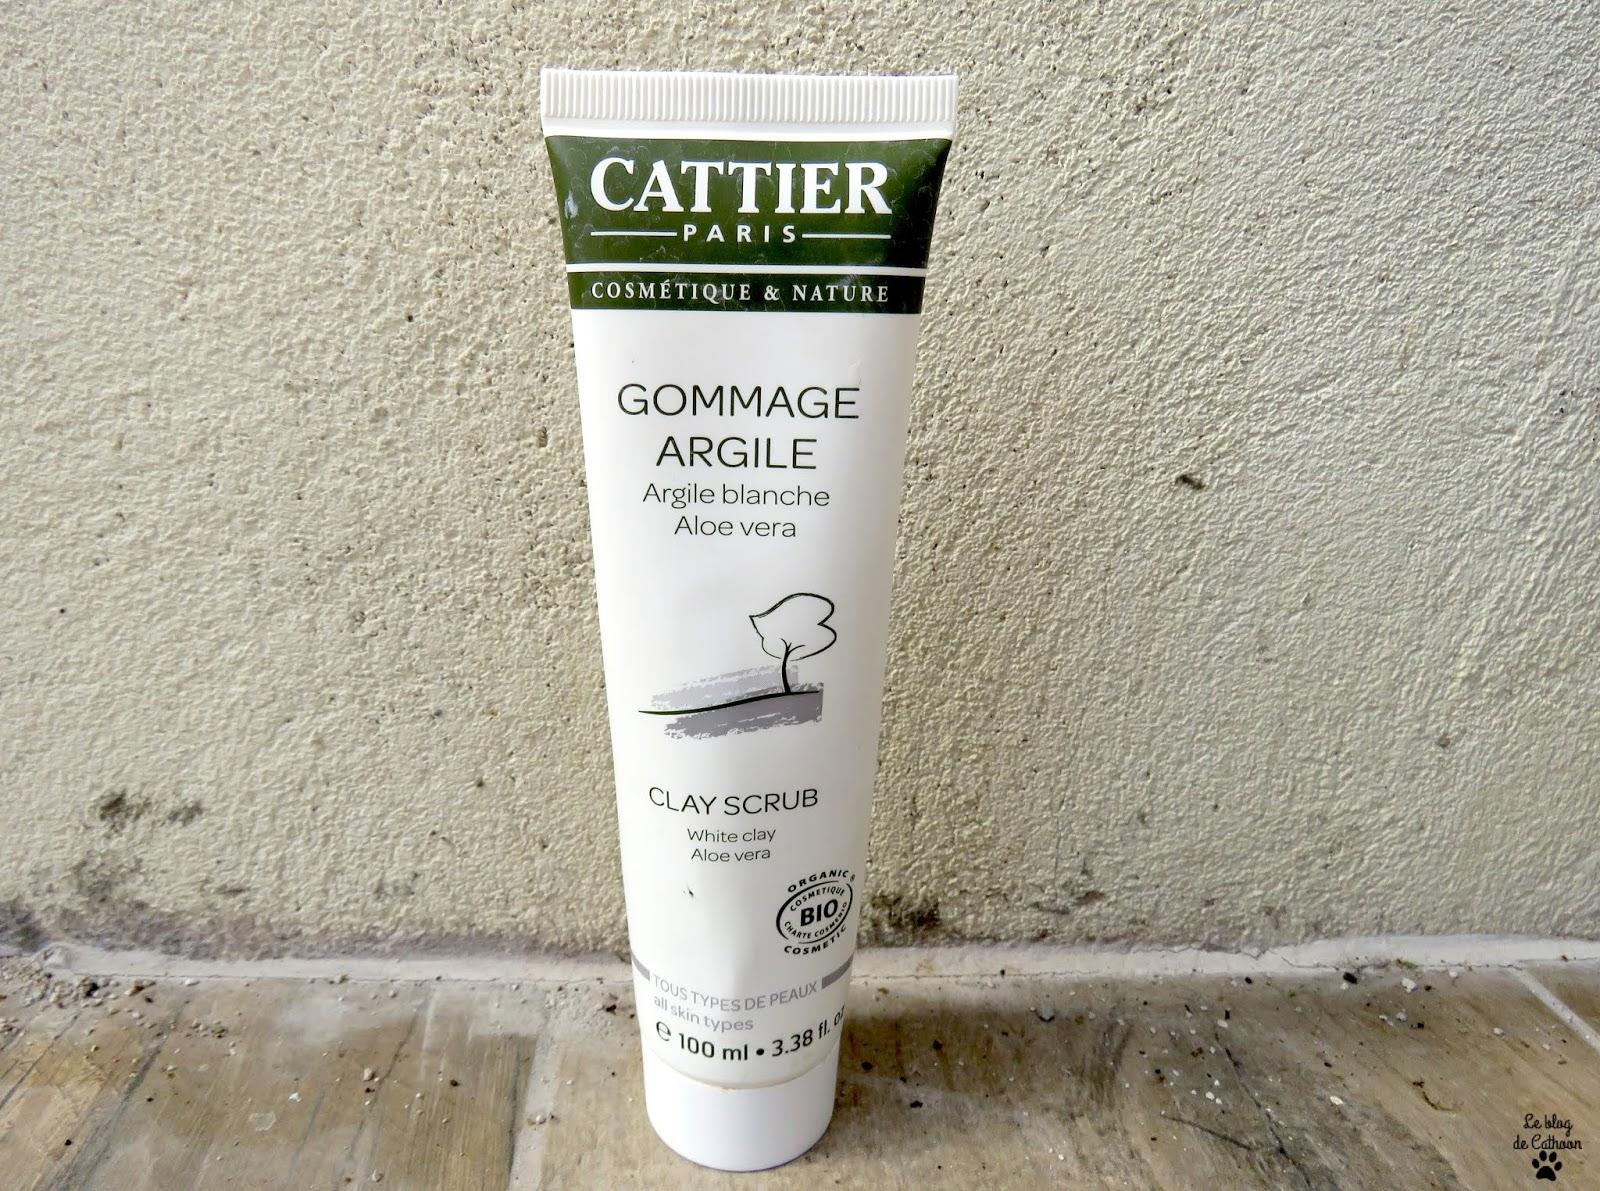 Gommage Argile - Argile Blanche Aloe Vera - Cattier